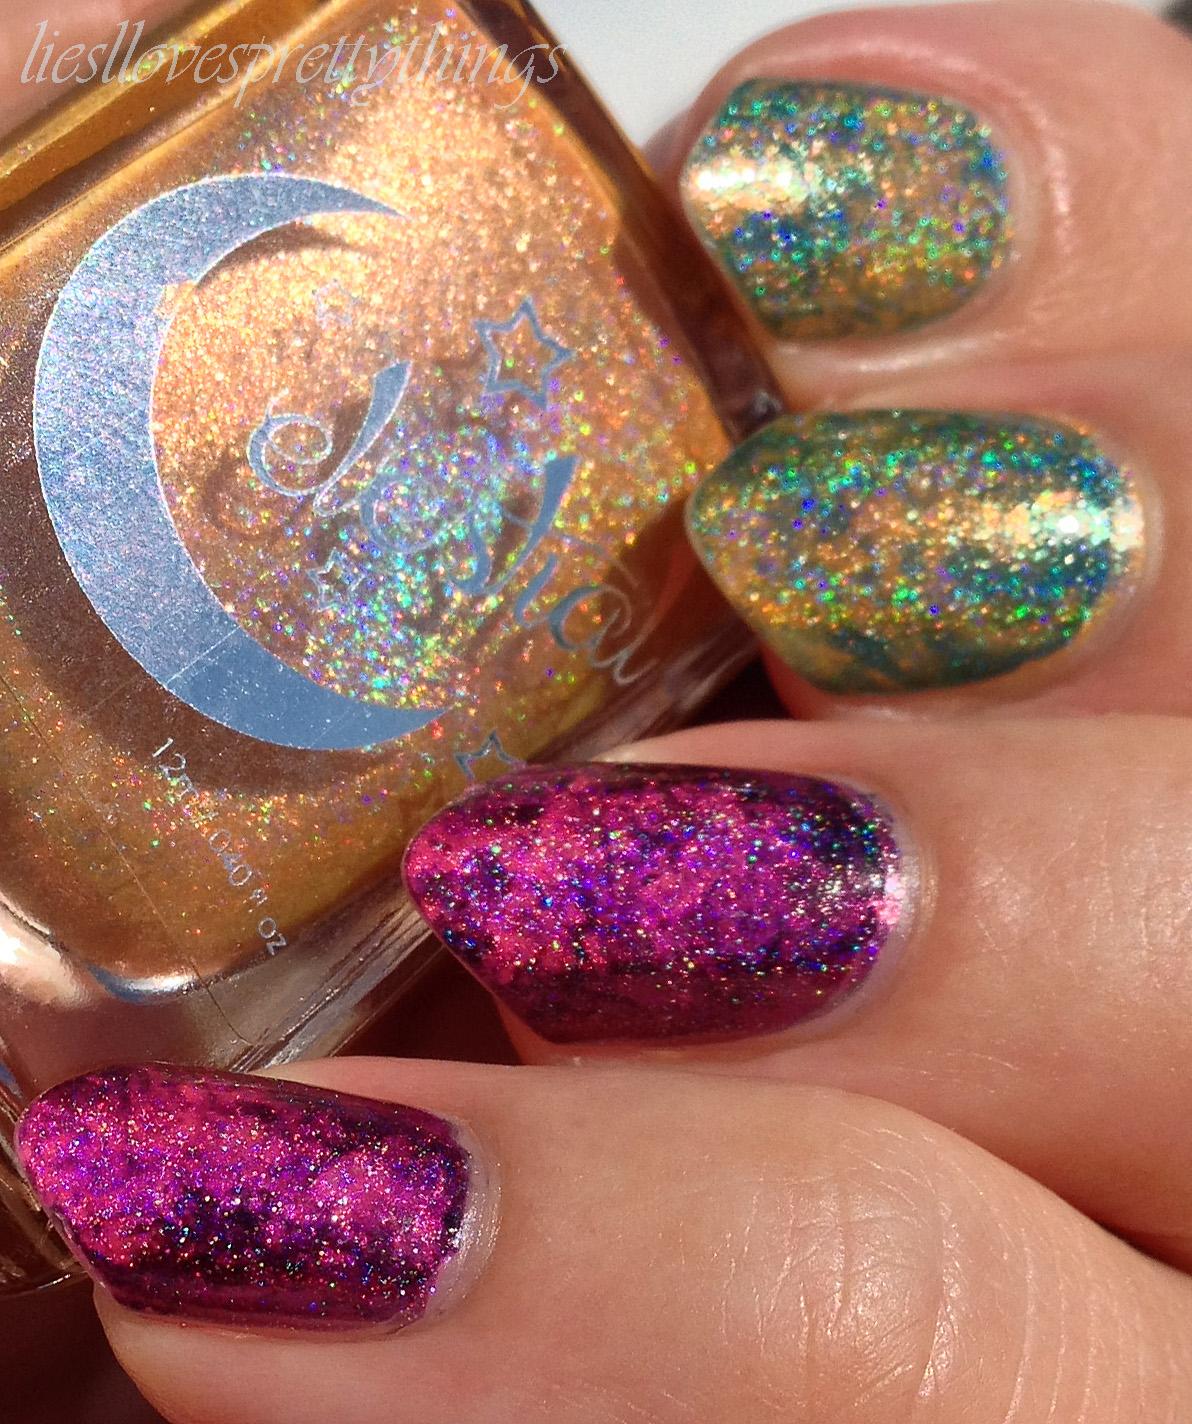 Celestial Cosmetics holo saran wrap manicure